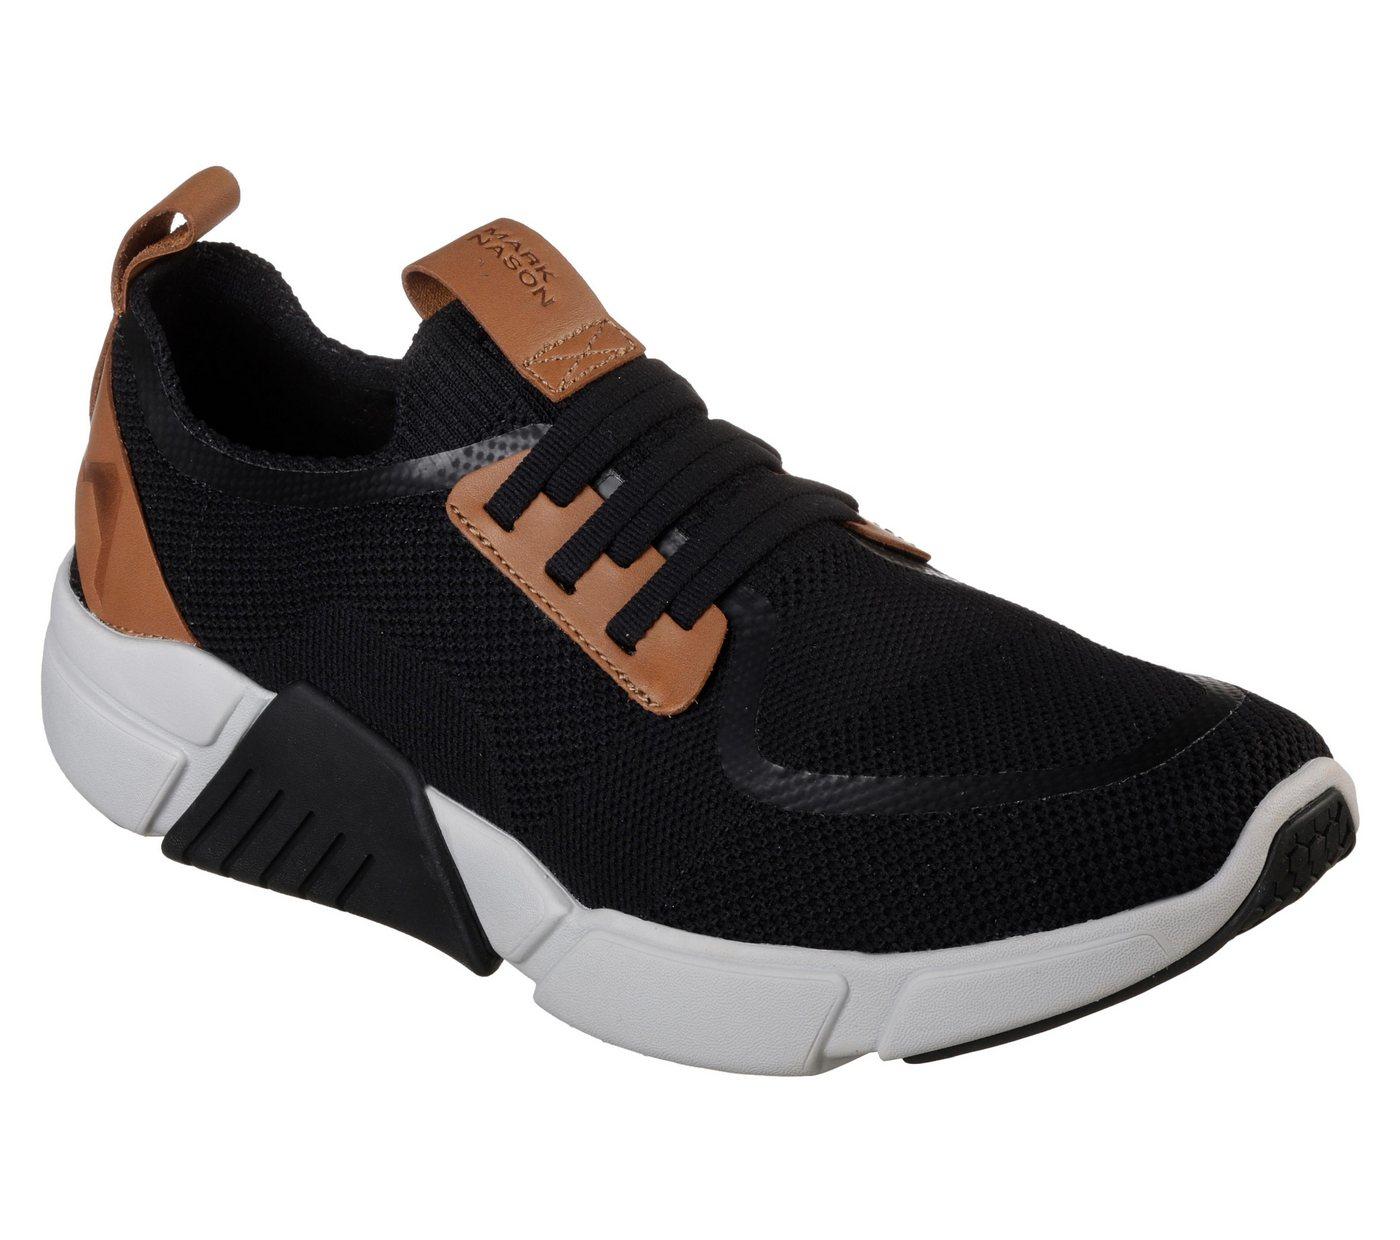 Herren Skechers Block-Peak Sneaker mit Sockfit zum Schlupfen schwarz | 00192283287985